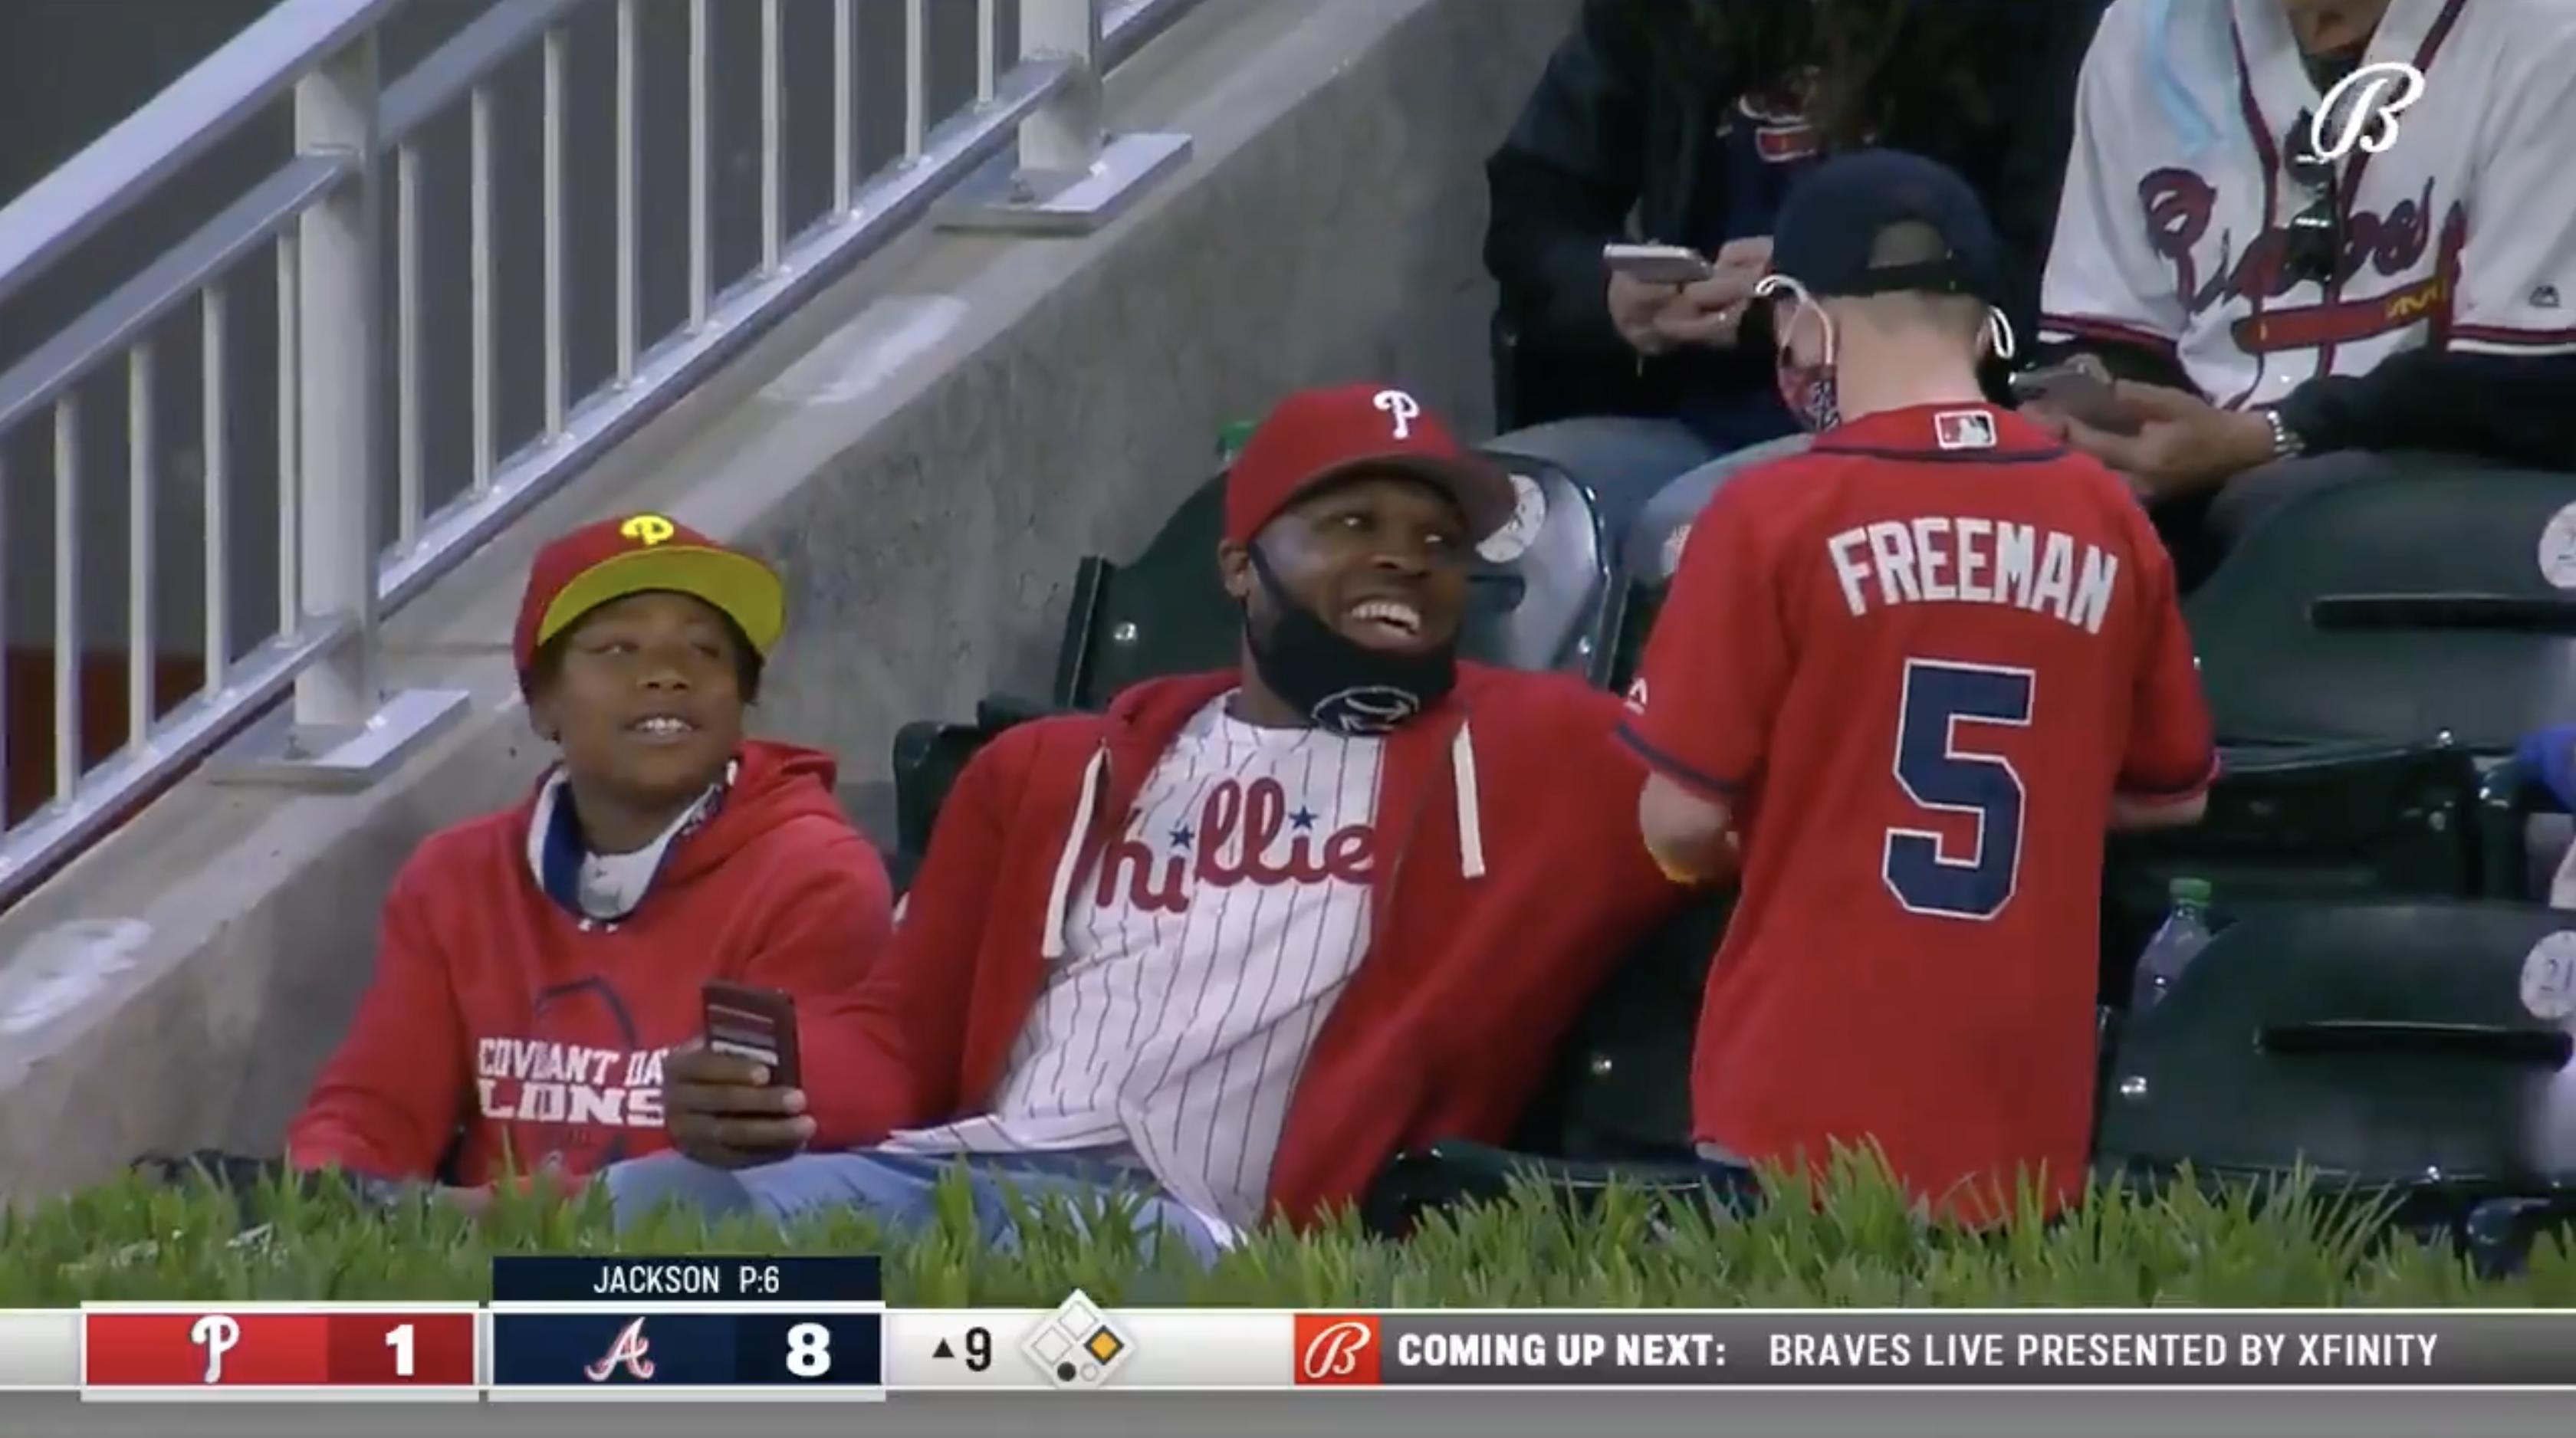 freeman home run ball